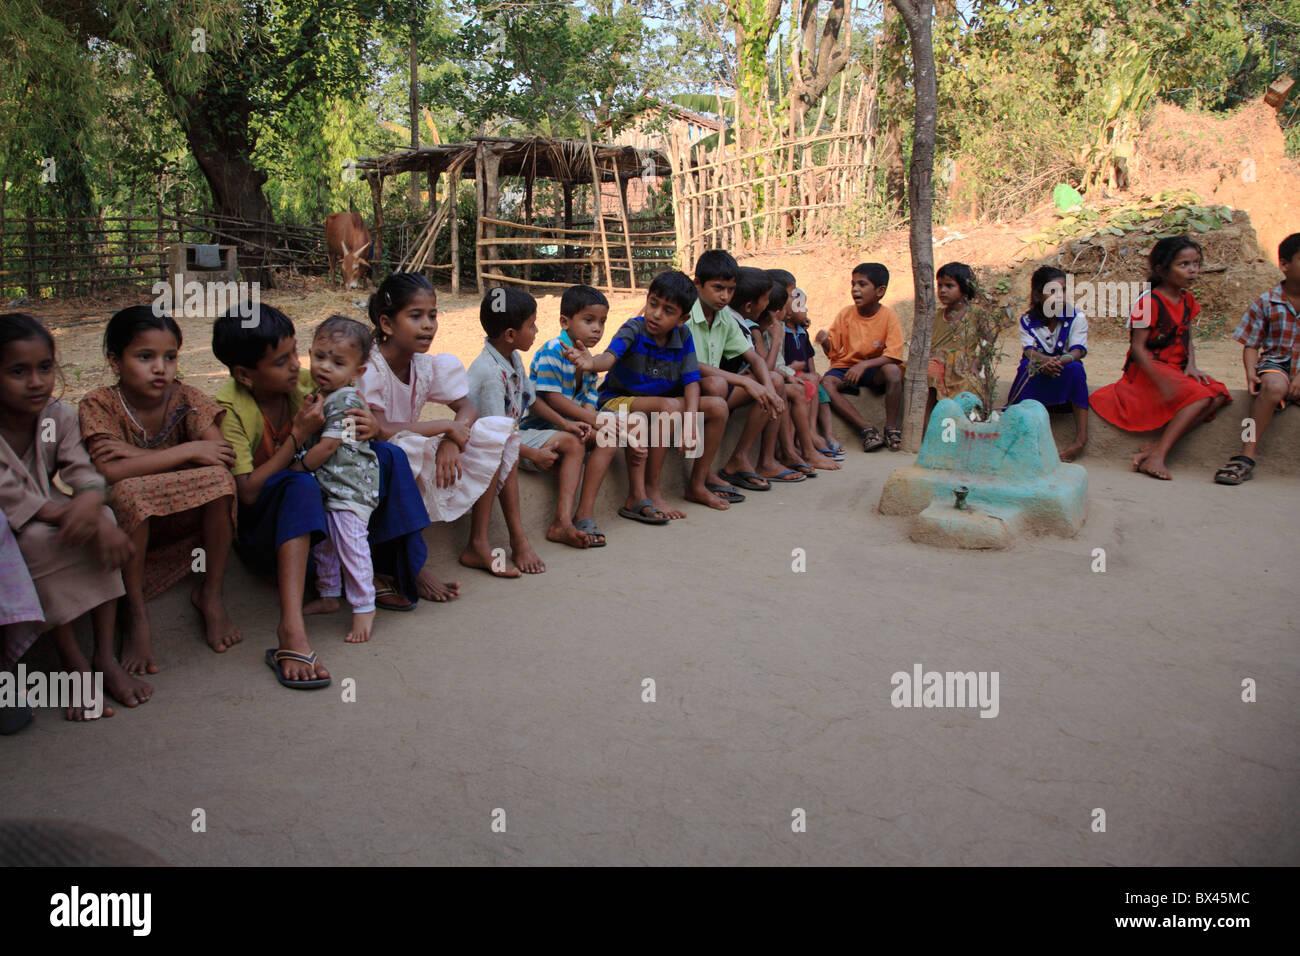 School children in the playground, Goa India - Stock Image